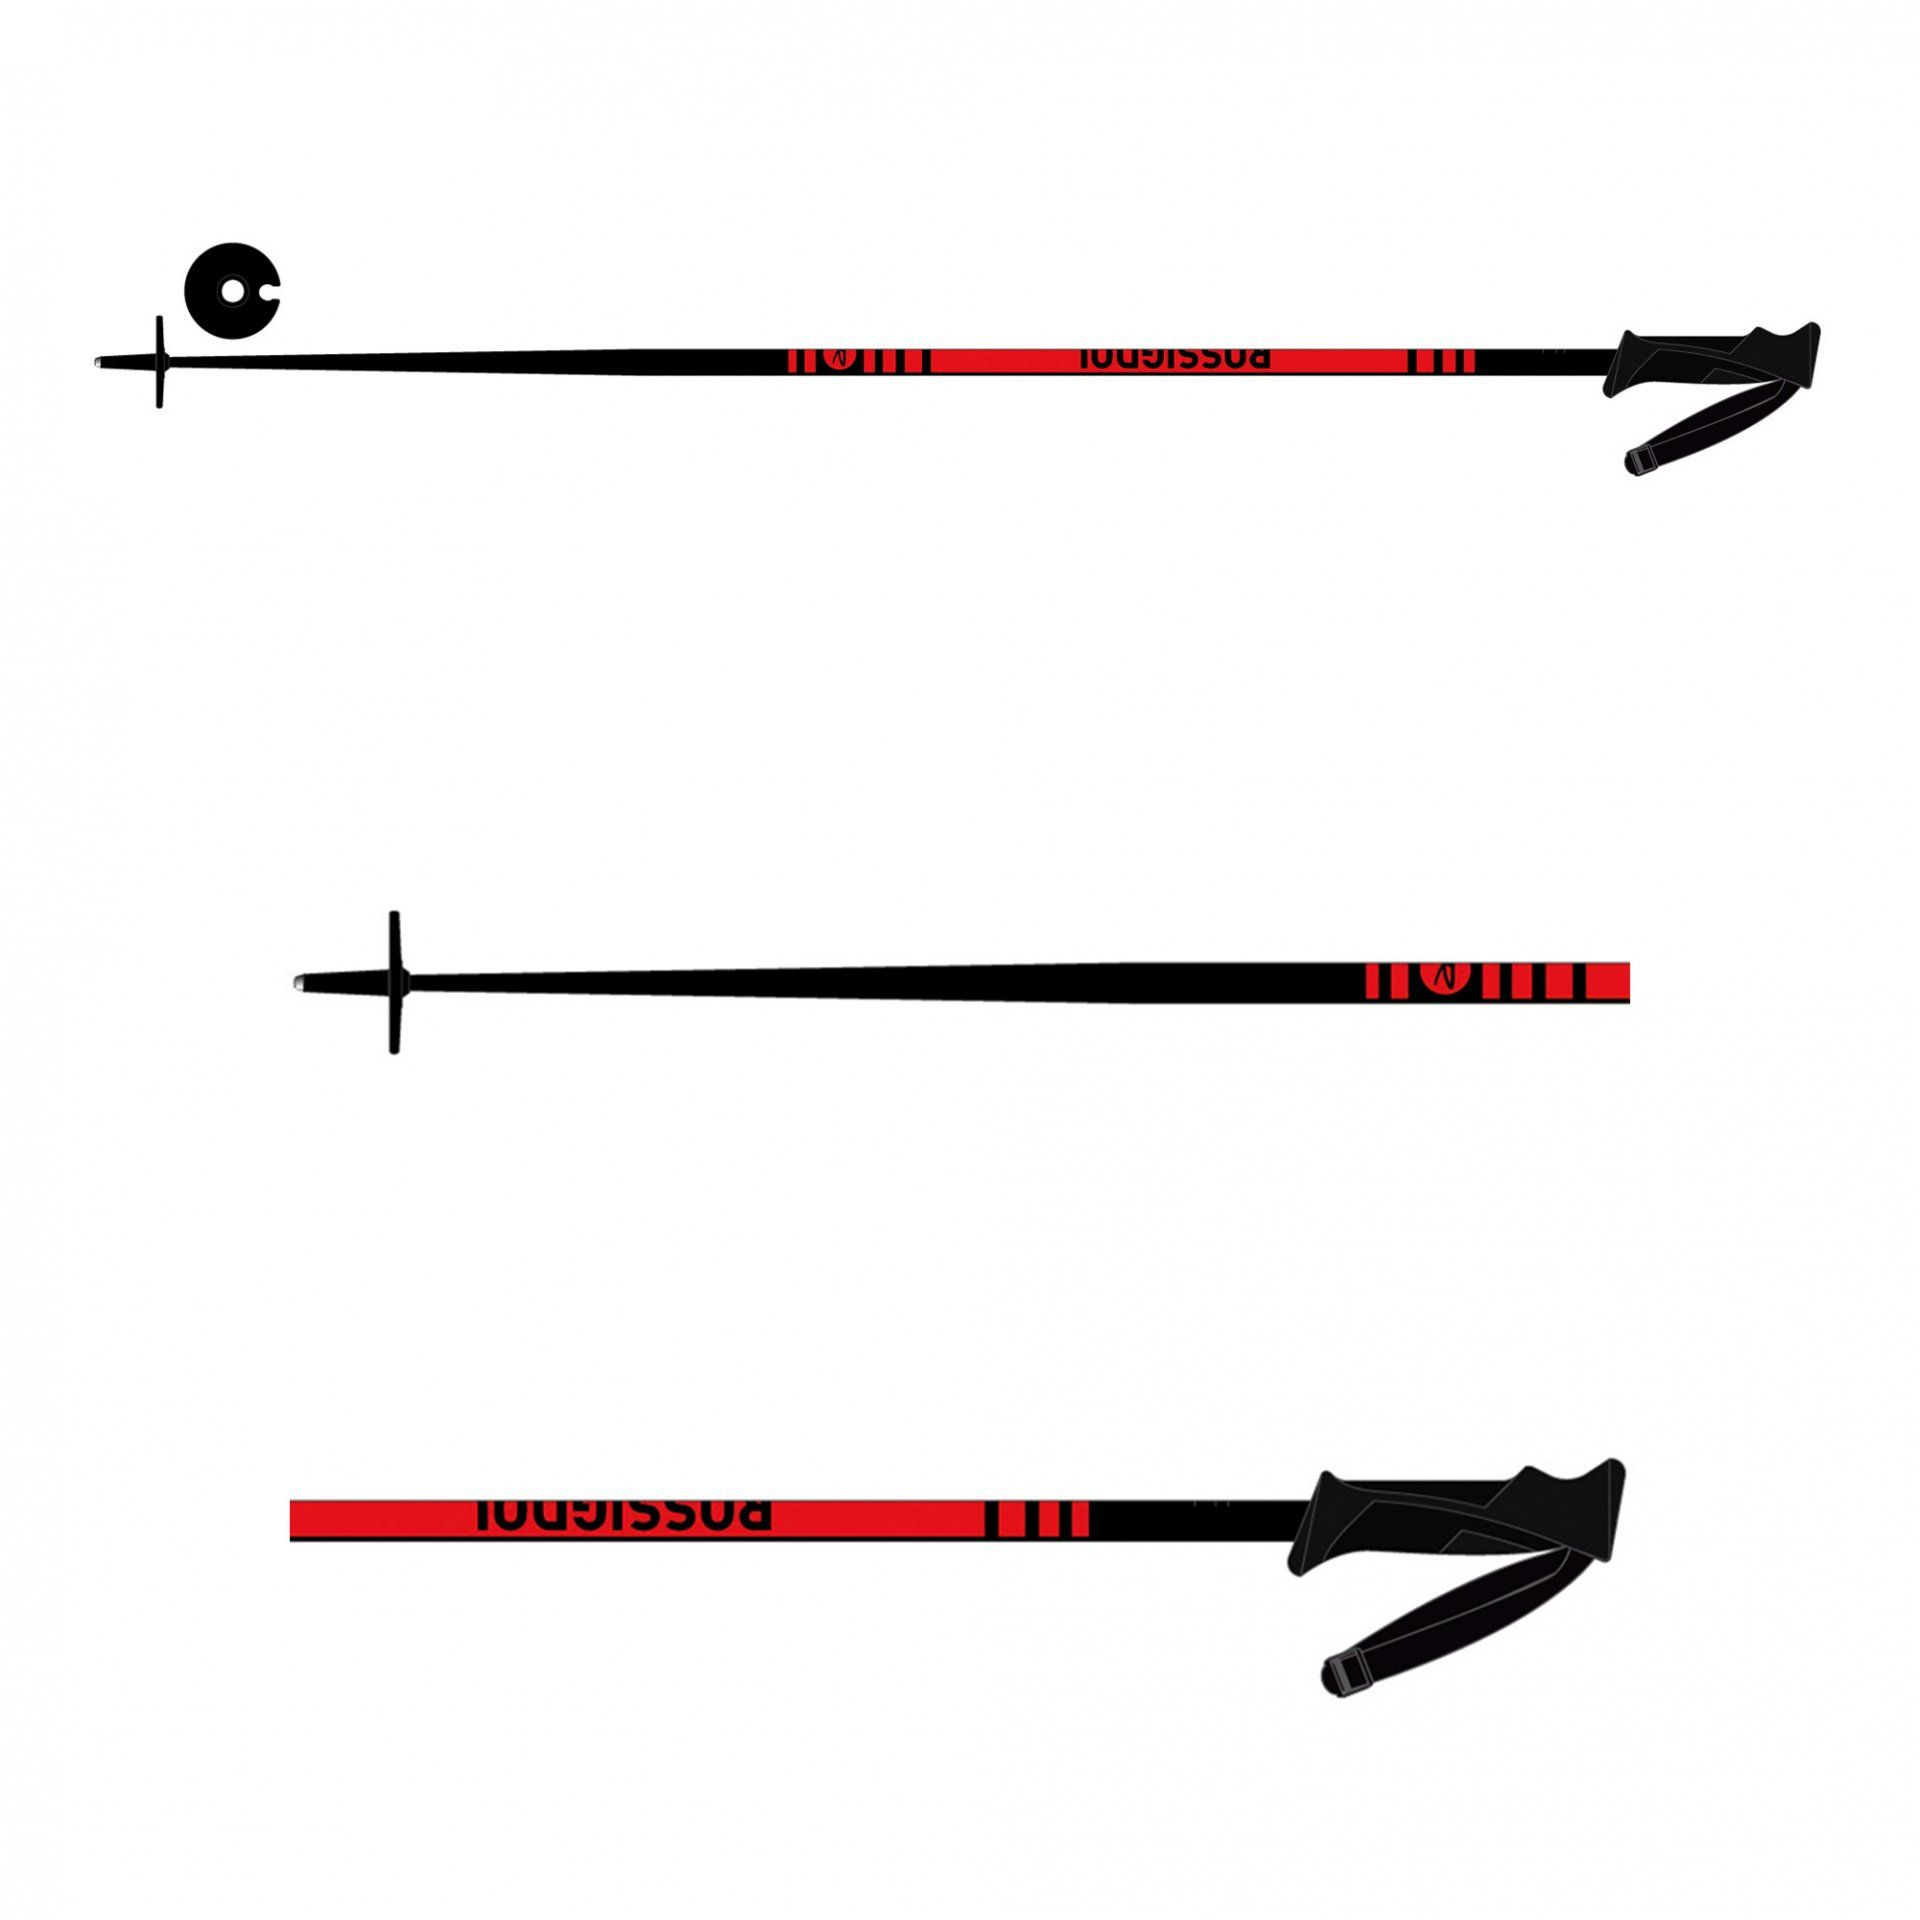 KIJE NARCIARSKIE ROSSIGNOL STOVE BOX 30 PAIRS RDI2080 BLACK RED